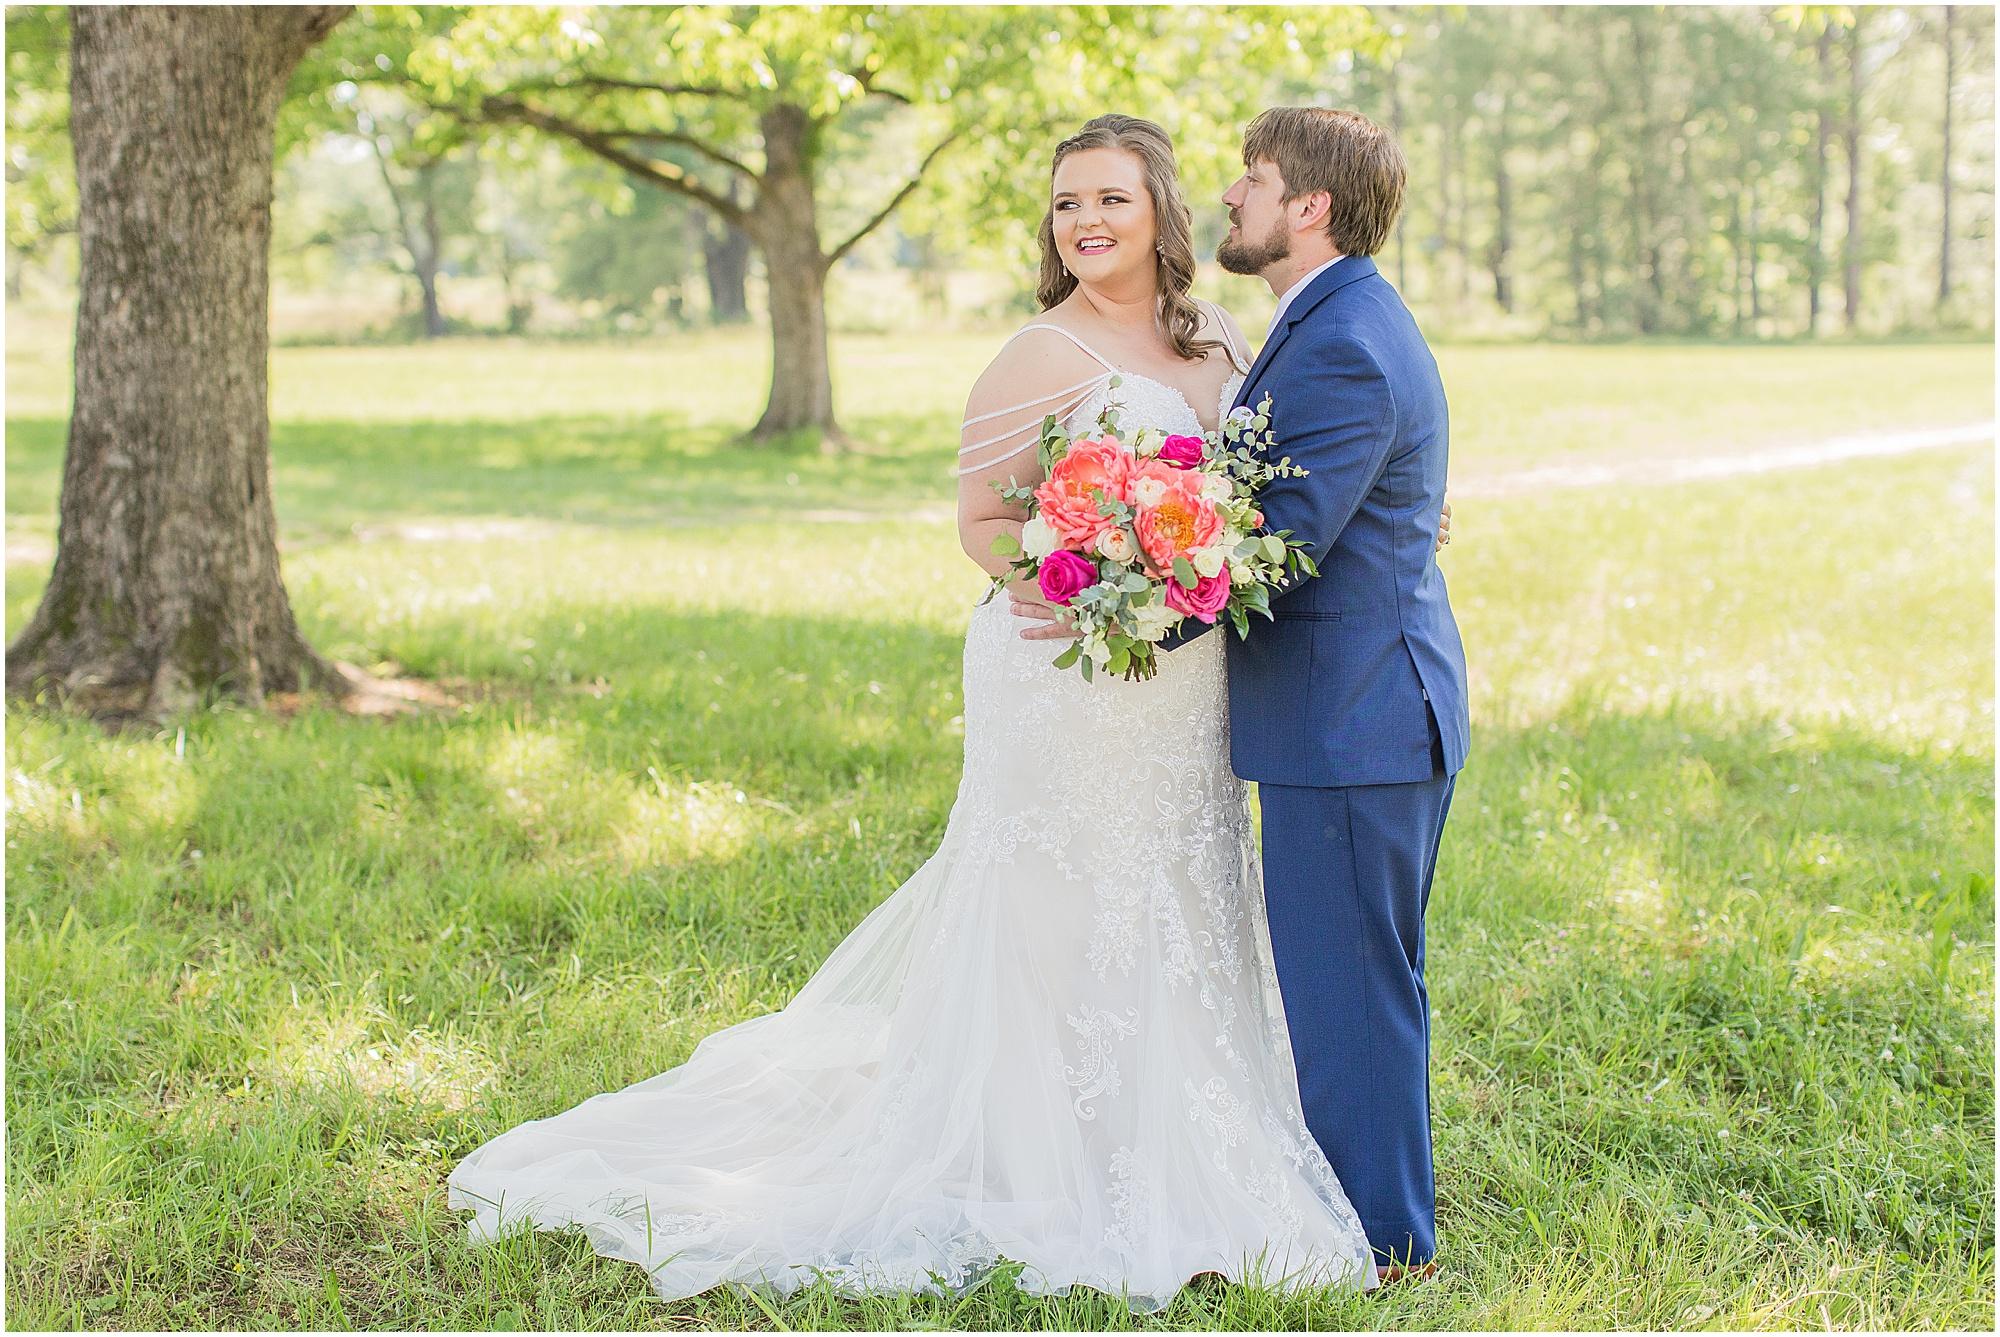 starkville-mississippi-wedding-page-place-dodson-farms_0028.jpg